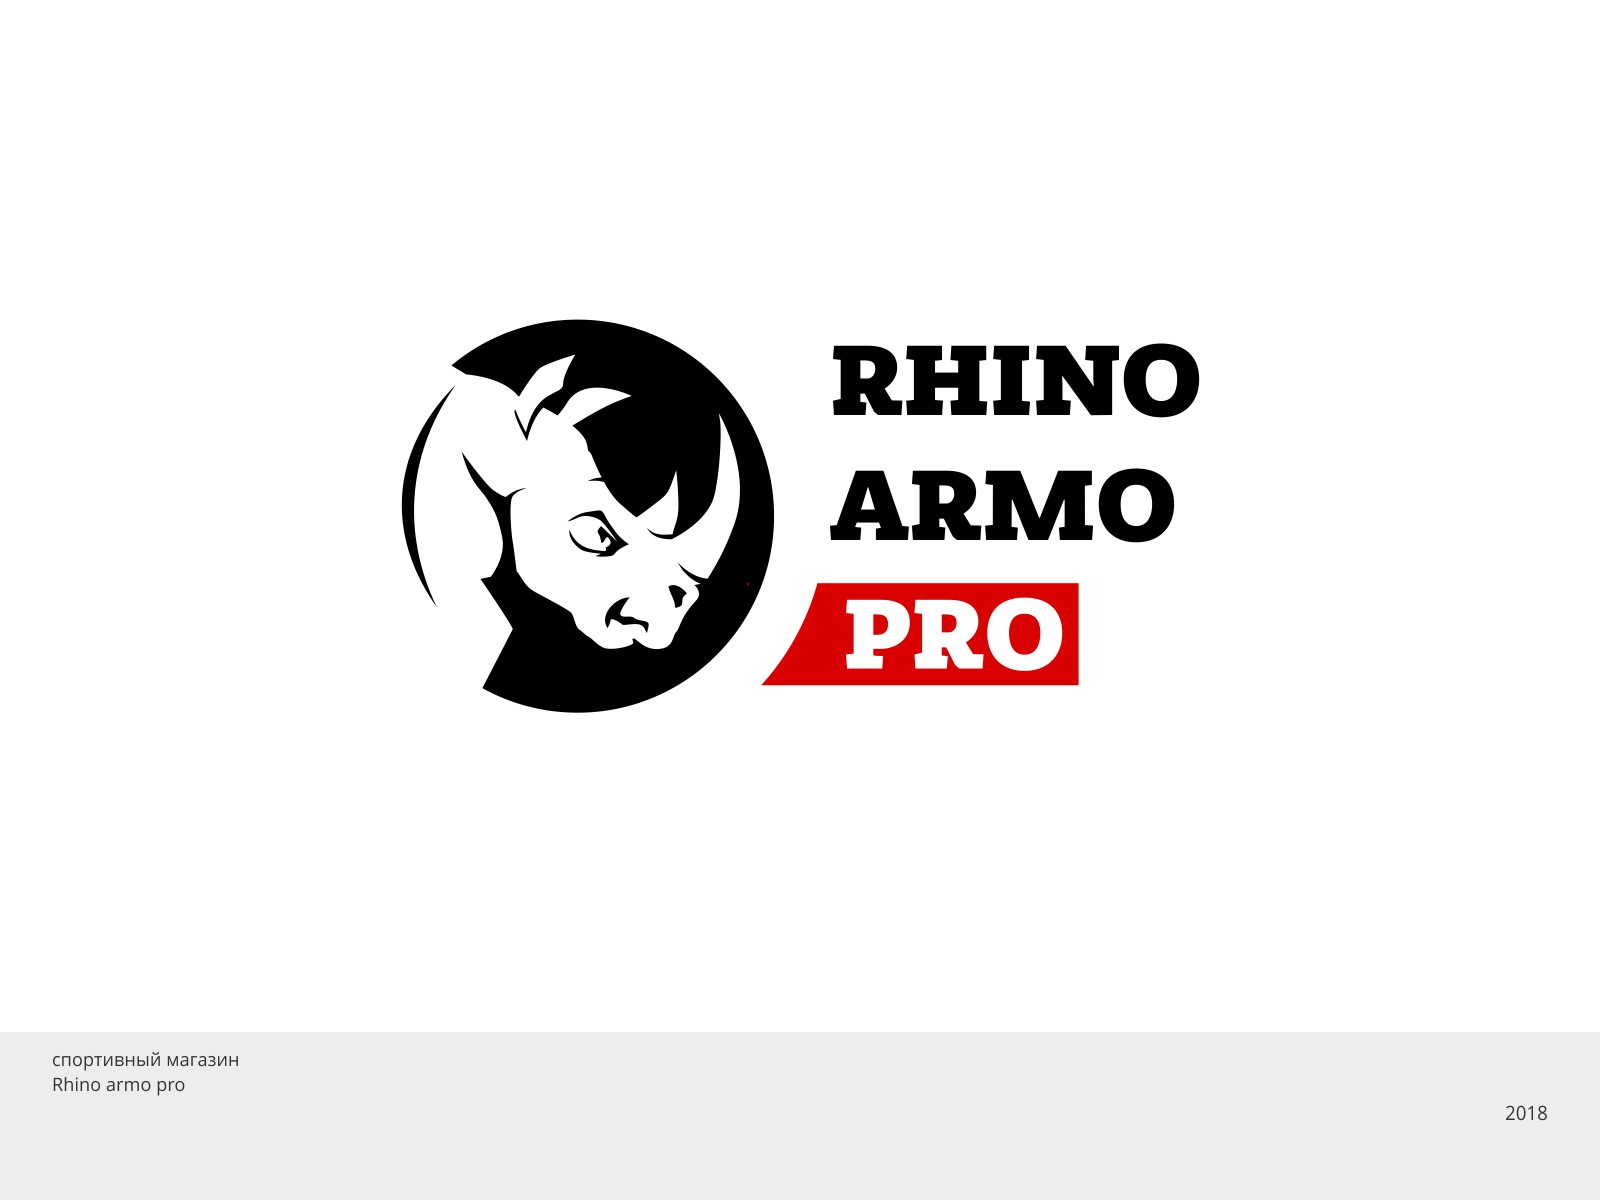 Логотип Rhino Armo Pro